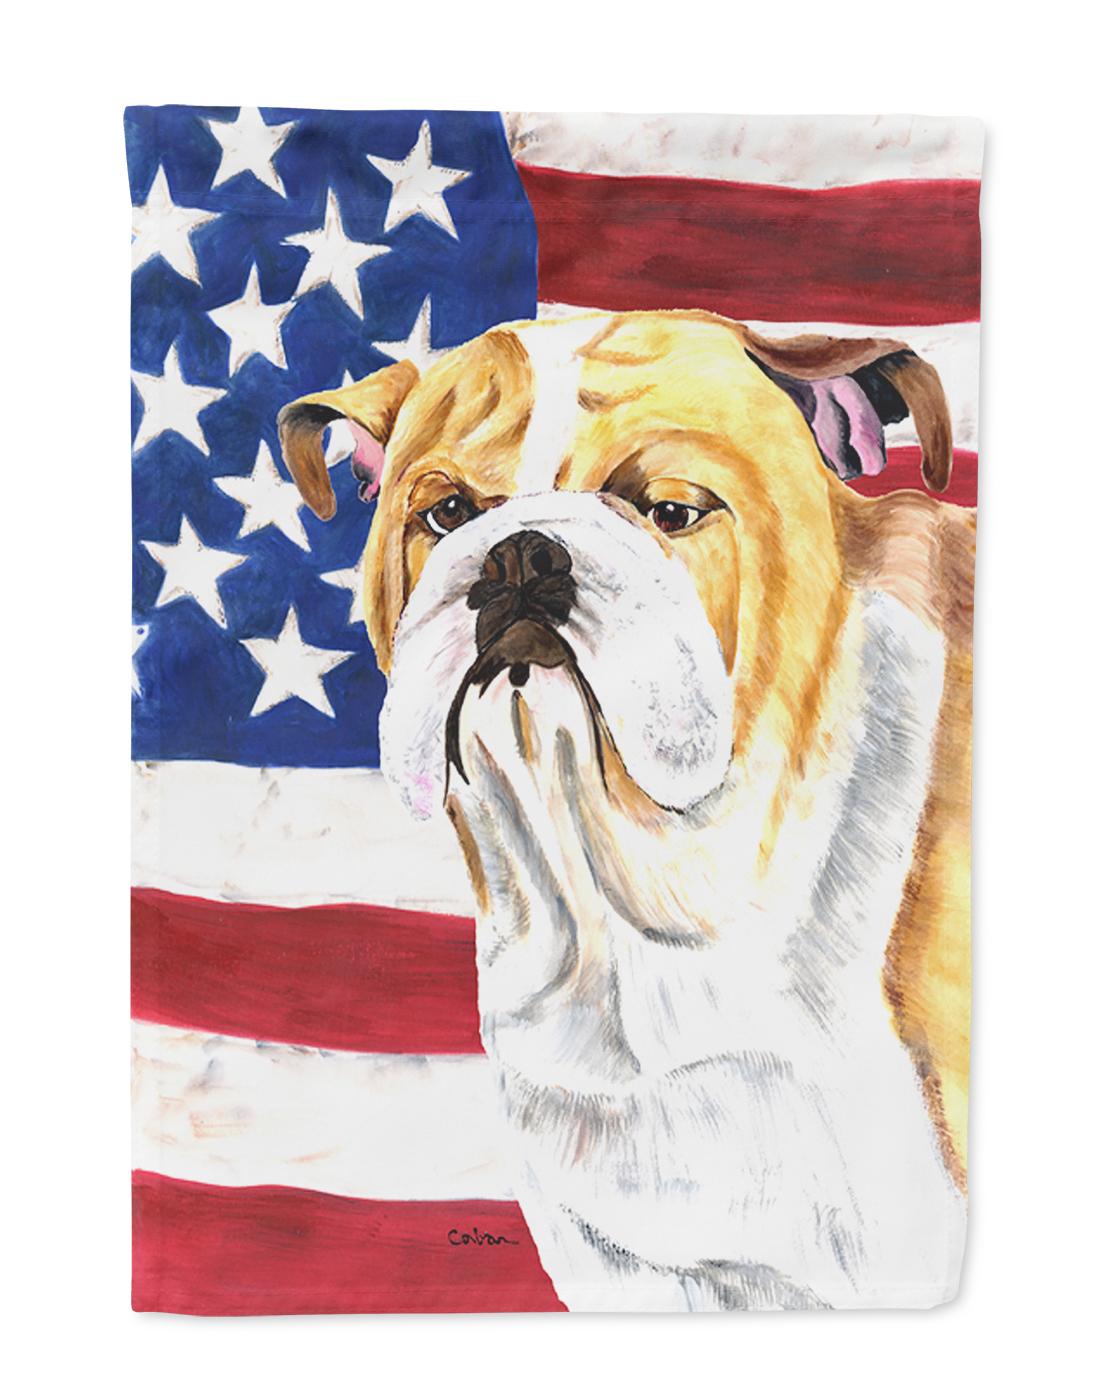 USA American Flag with Bulldog English Flag by Caroline